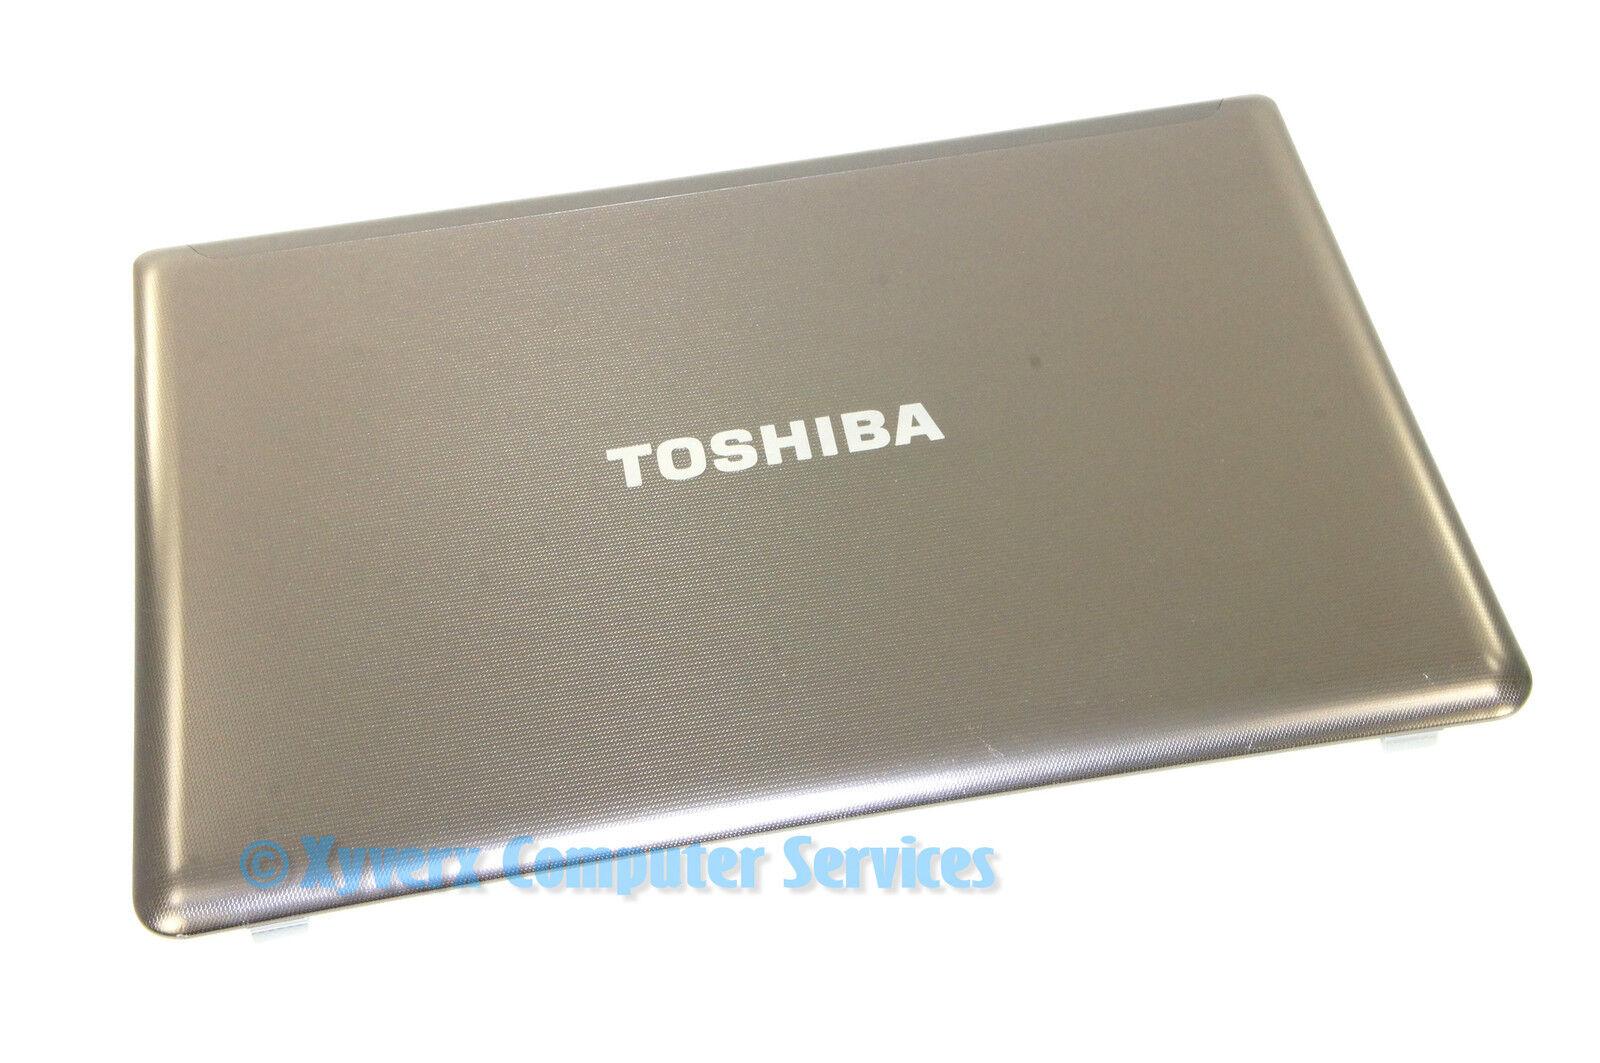 TOSHIBA SATELLITE P855 FINGERPRINT DRIVERS FOR MAC